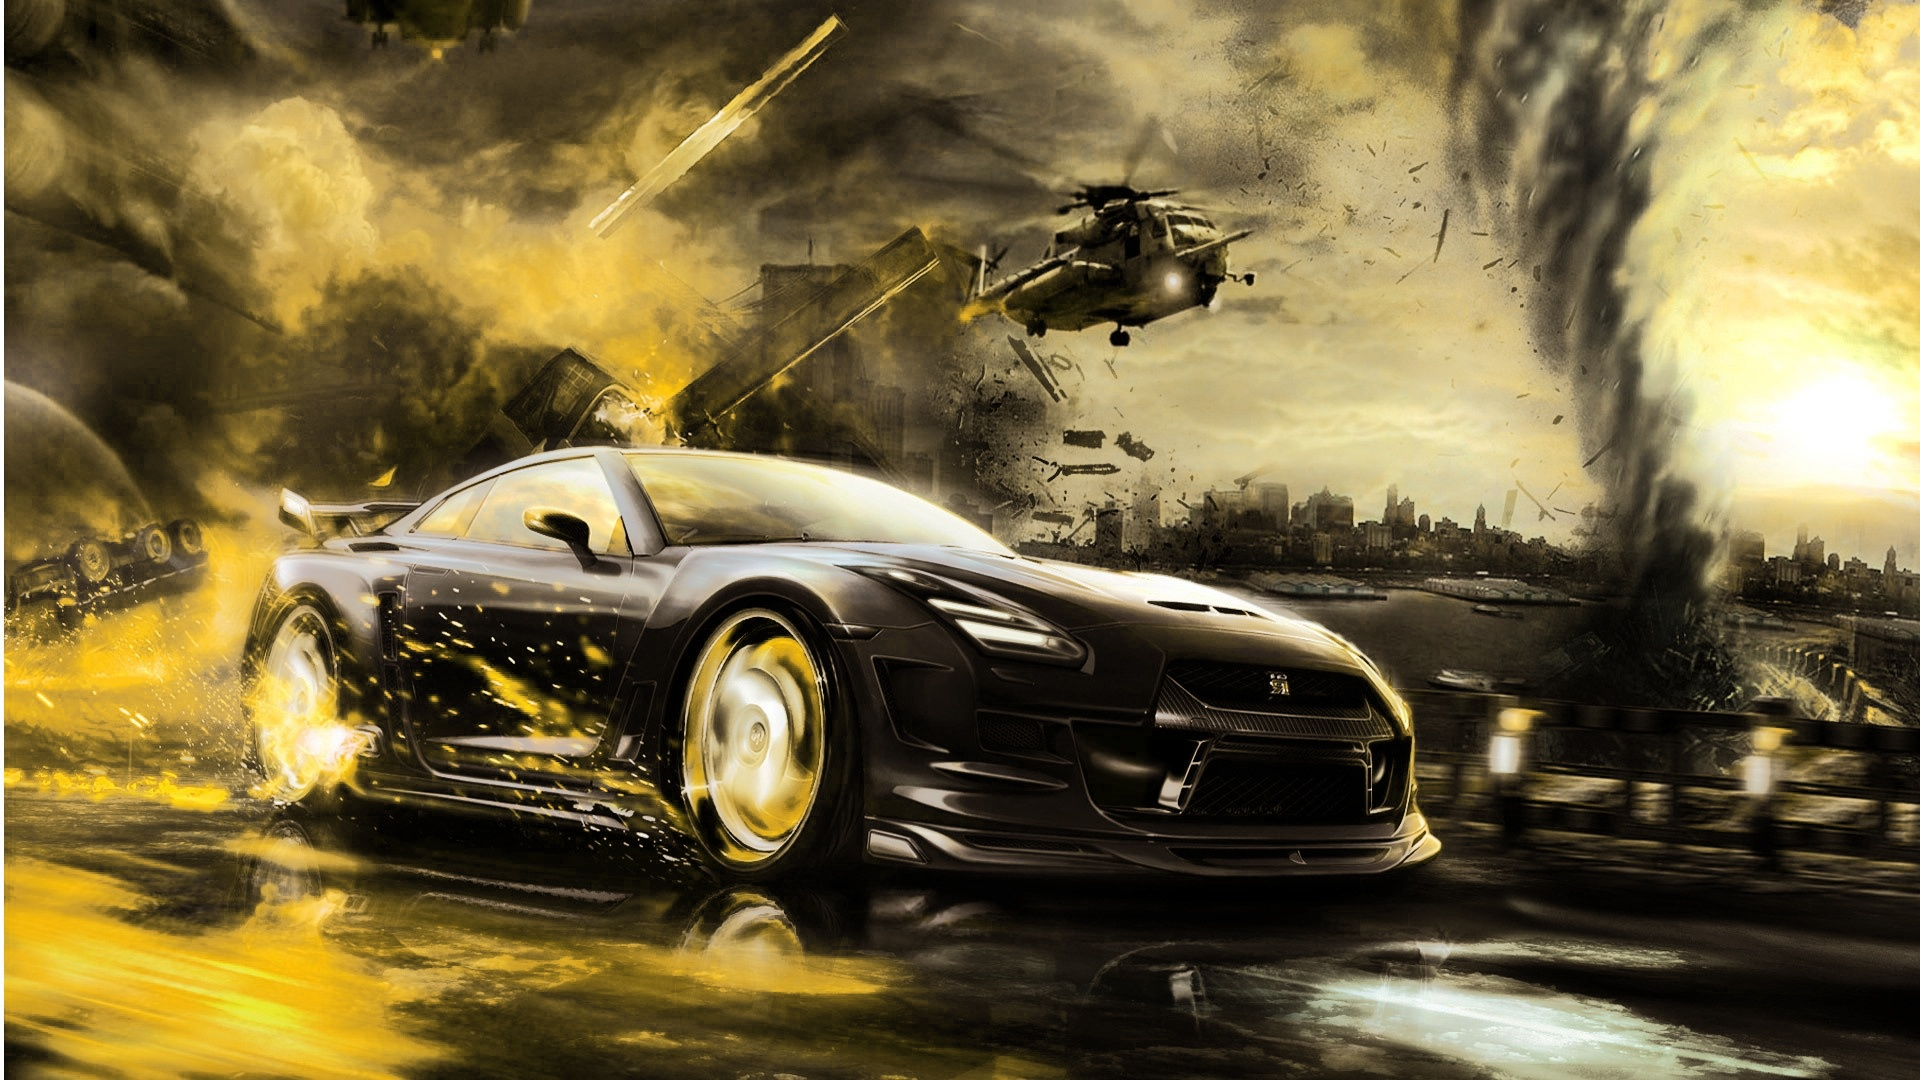 Full Hd Car Wallpapers 1080p Bmw Free Cars Full Hd Images 1080p Pixelstalk Net